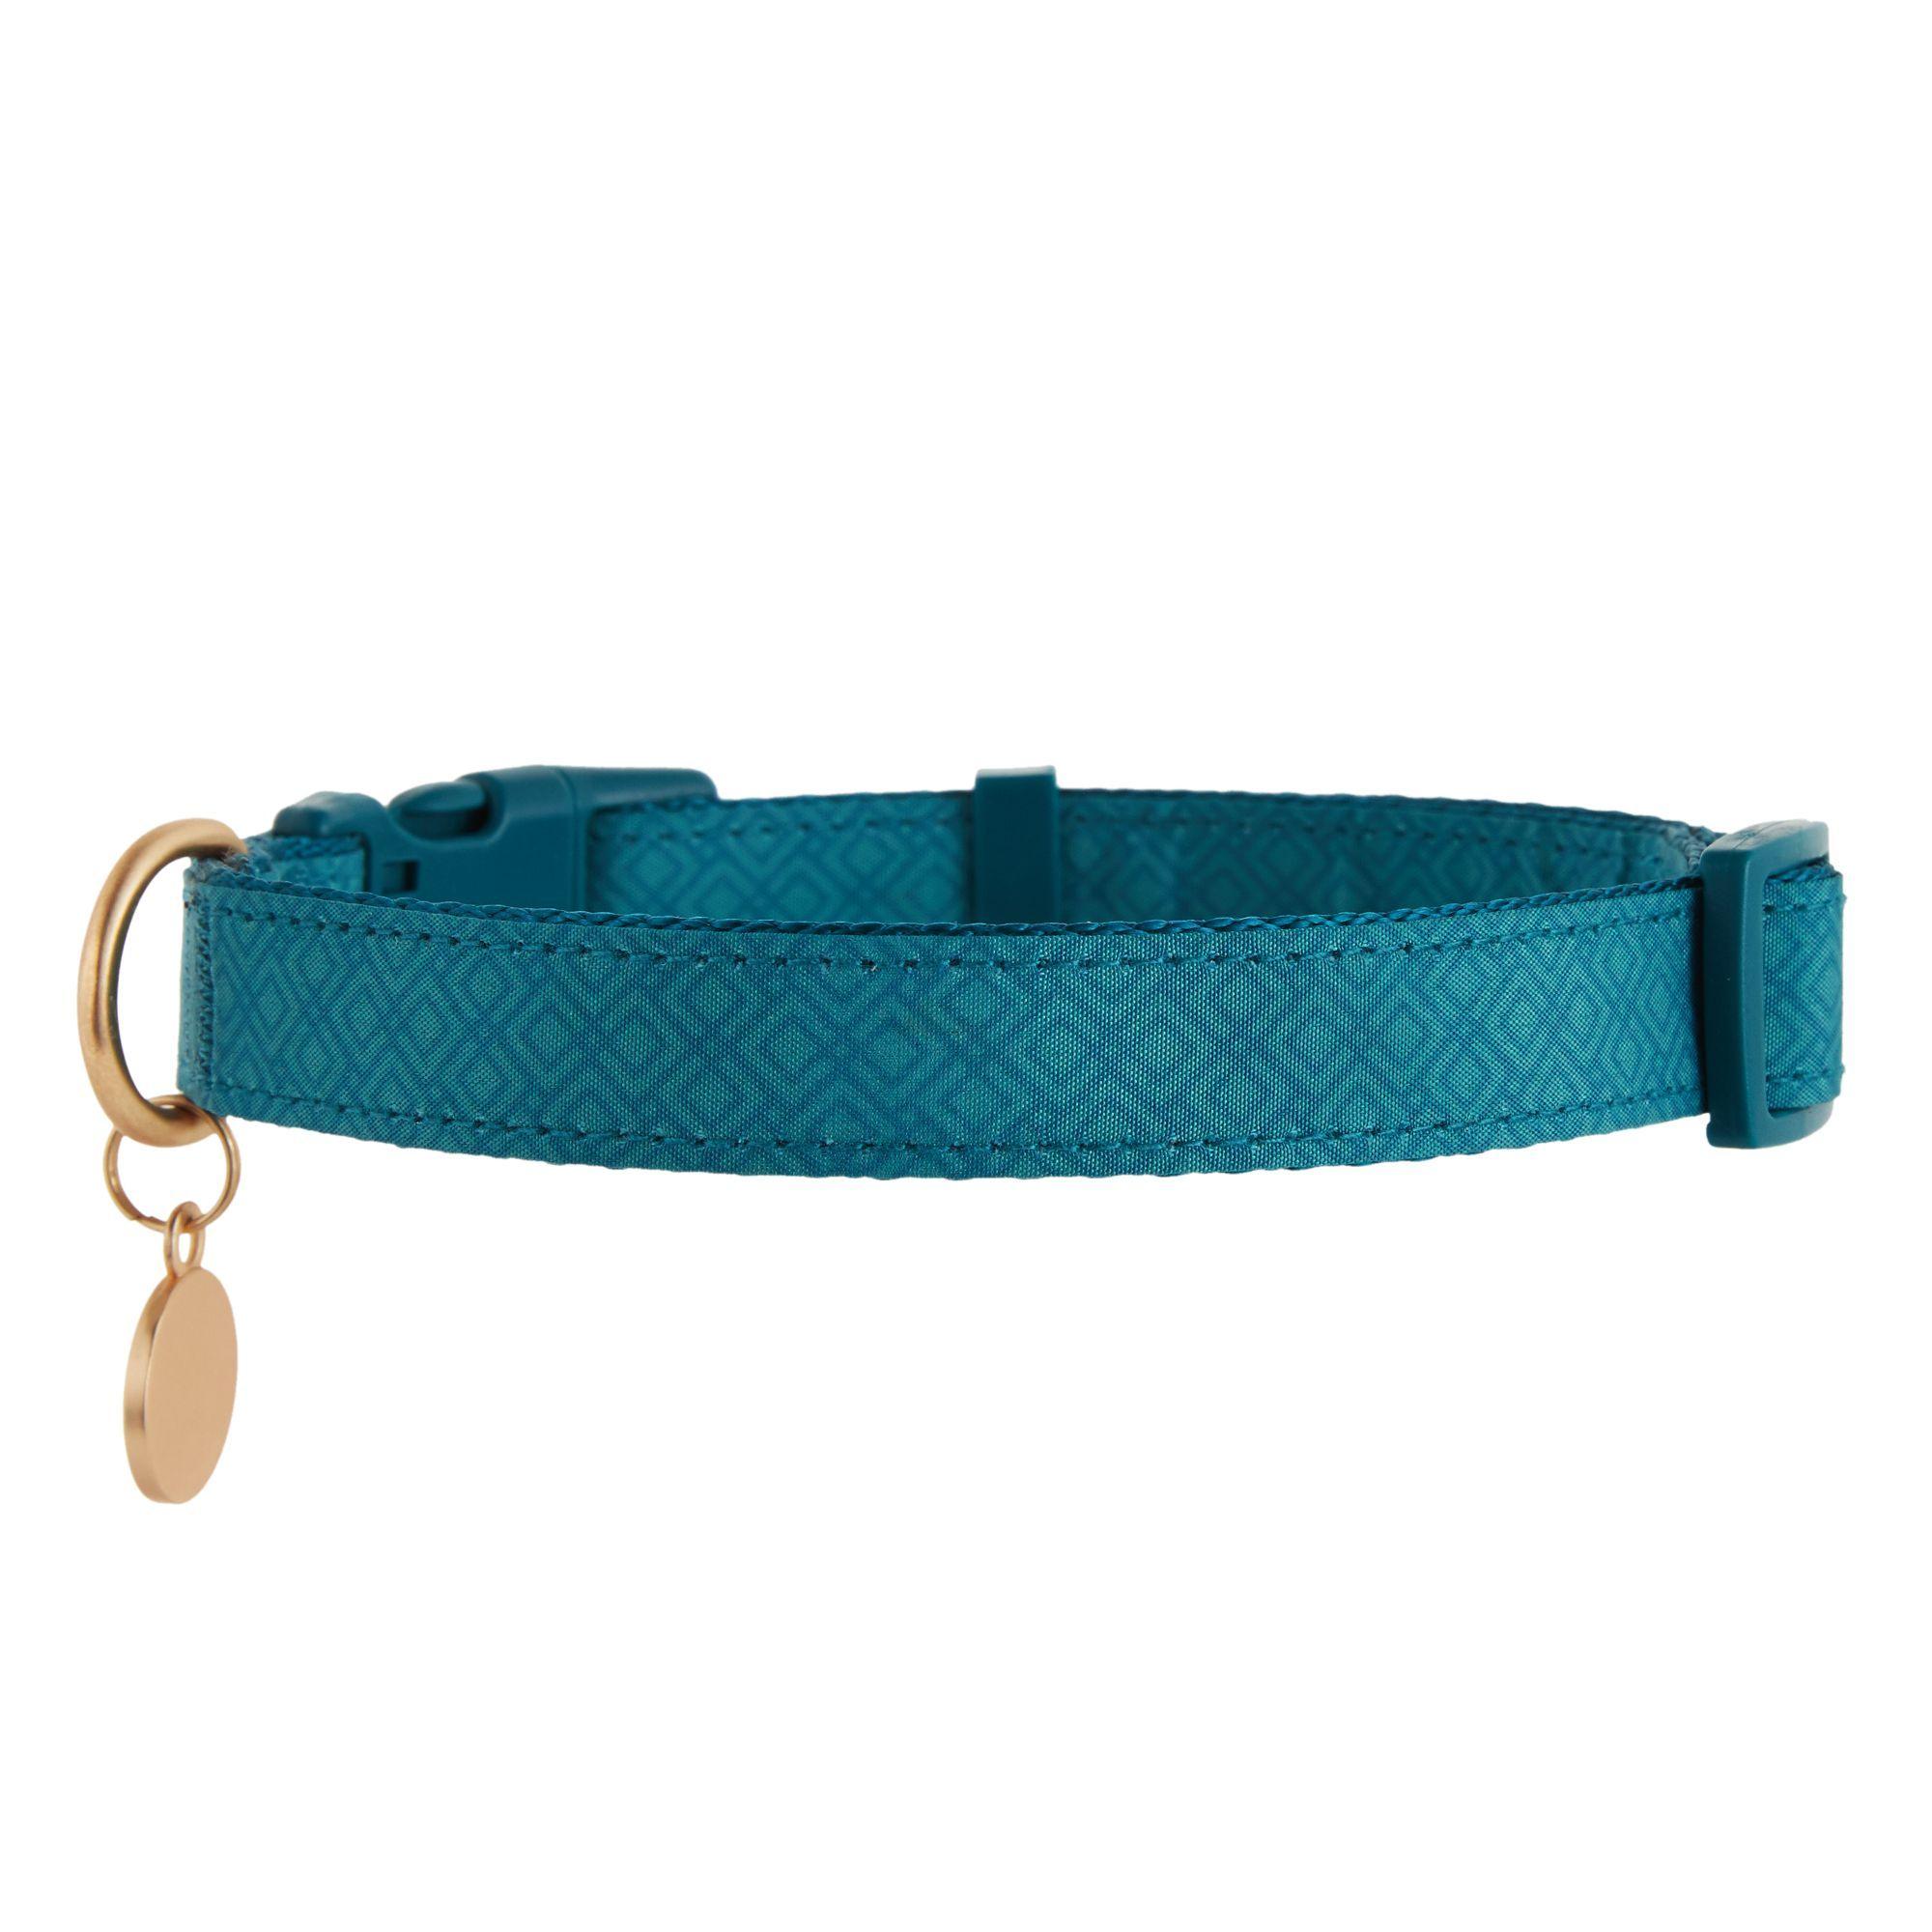 Dog Dazzlers Holiday Striped Dog Collar Dog Collars Petsmart Holiday Dog Collar Dog Collar Christmas Dog Collar